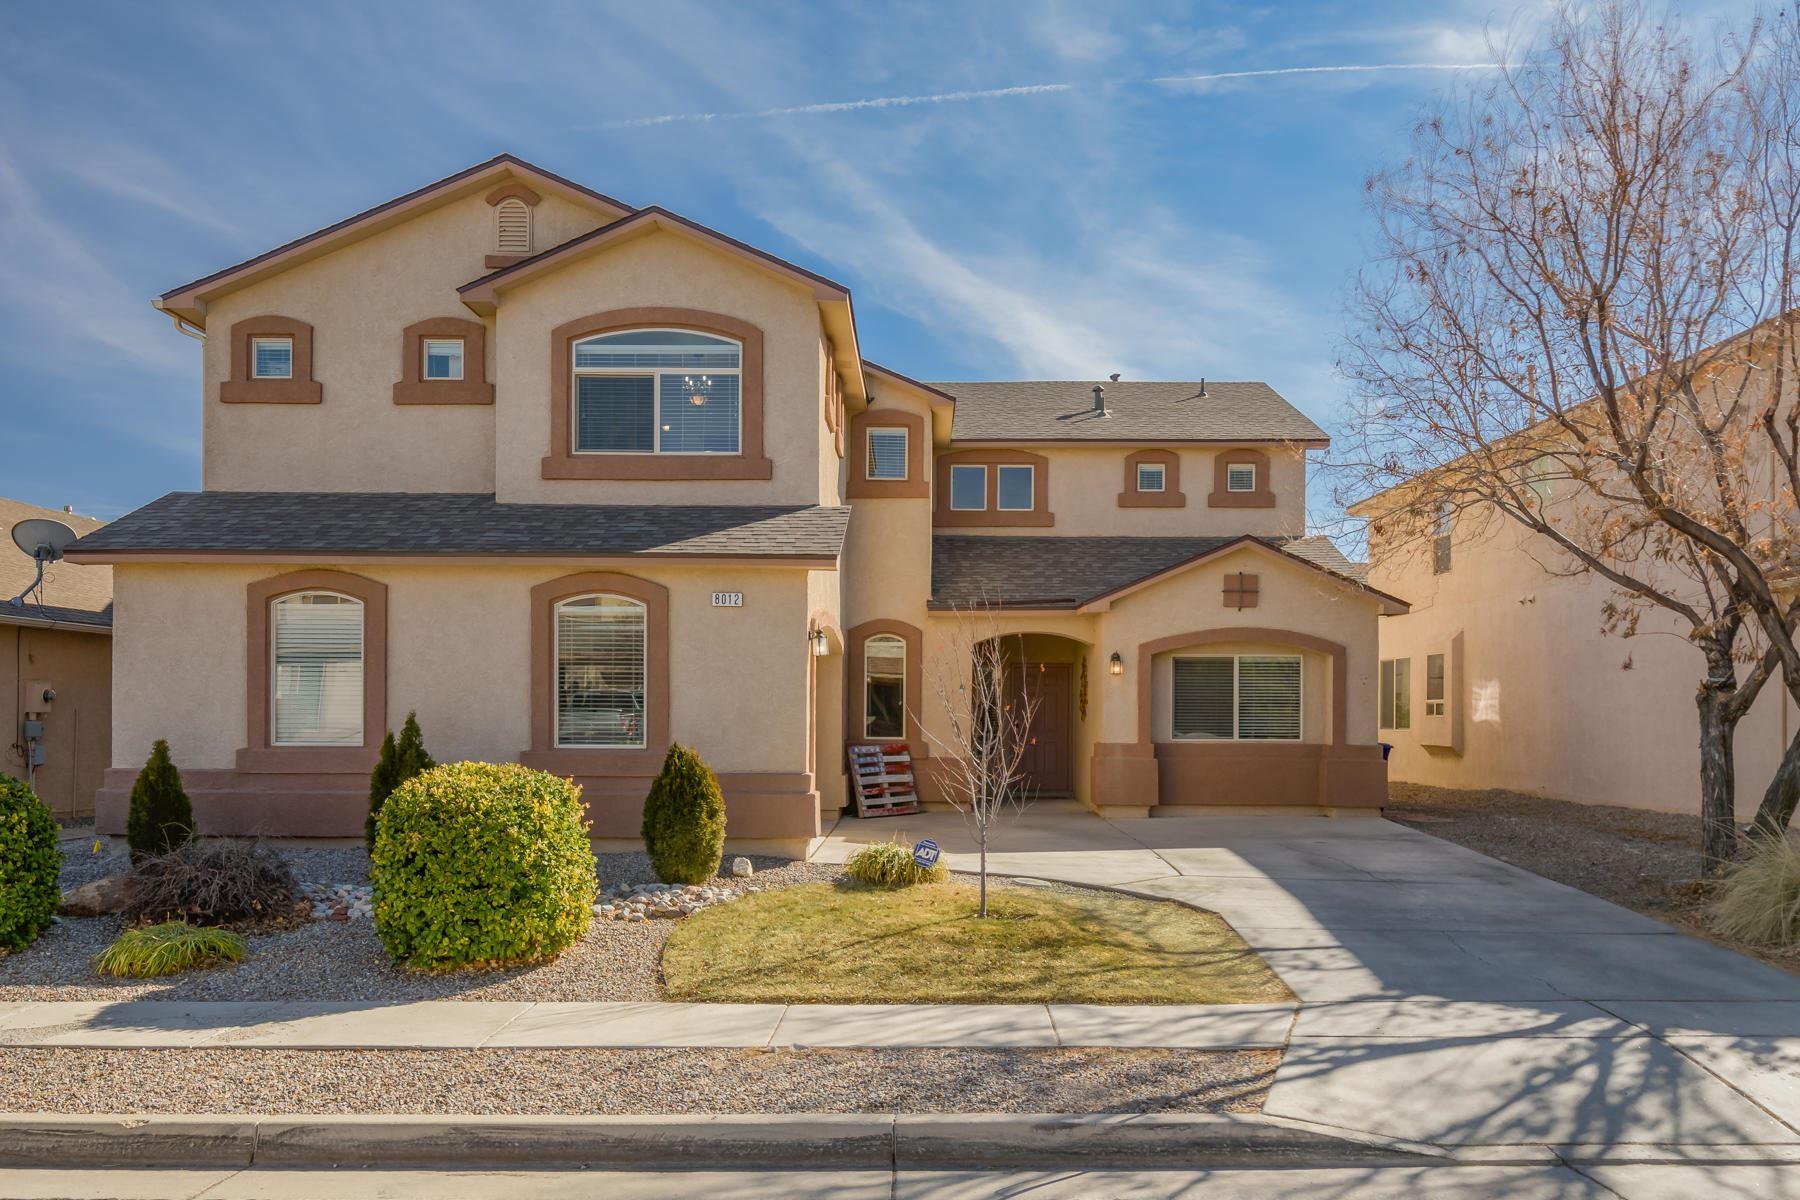 8012 PONY HILLS Place NW, Albuquerque, NM 87114 - MLS#: 985135